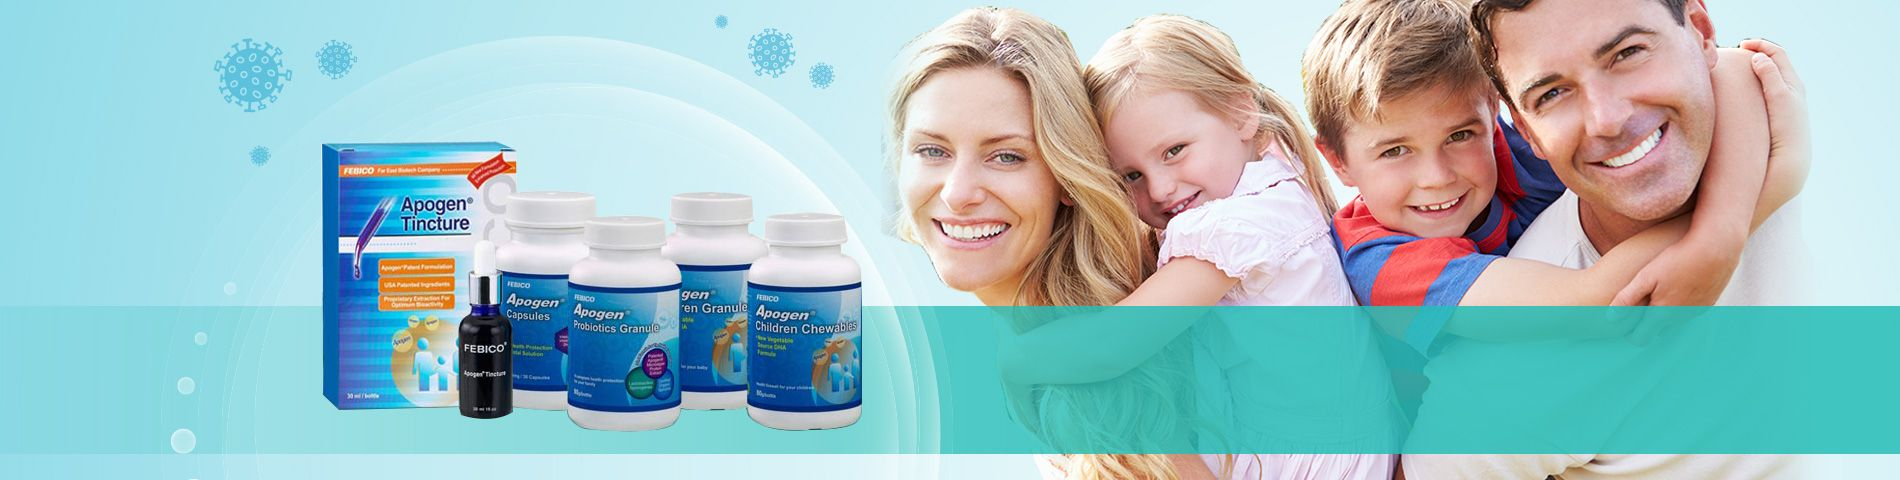 Apogen® Natural Anti-Viral Remedy Immune Support Booster Supplement